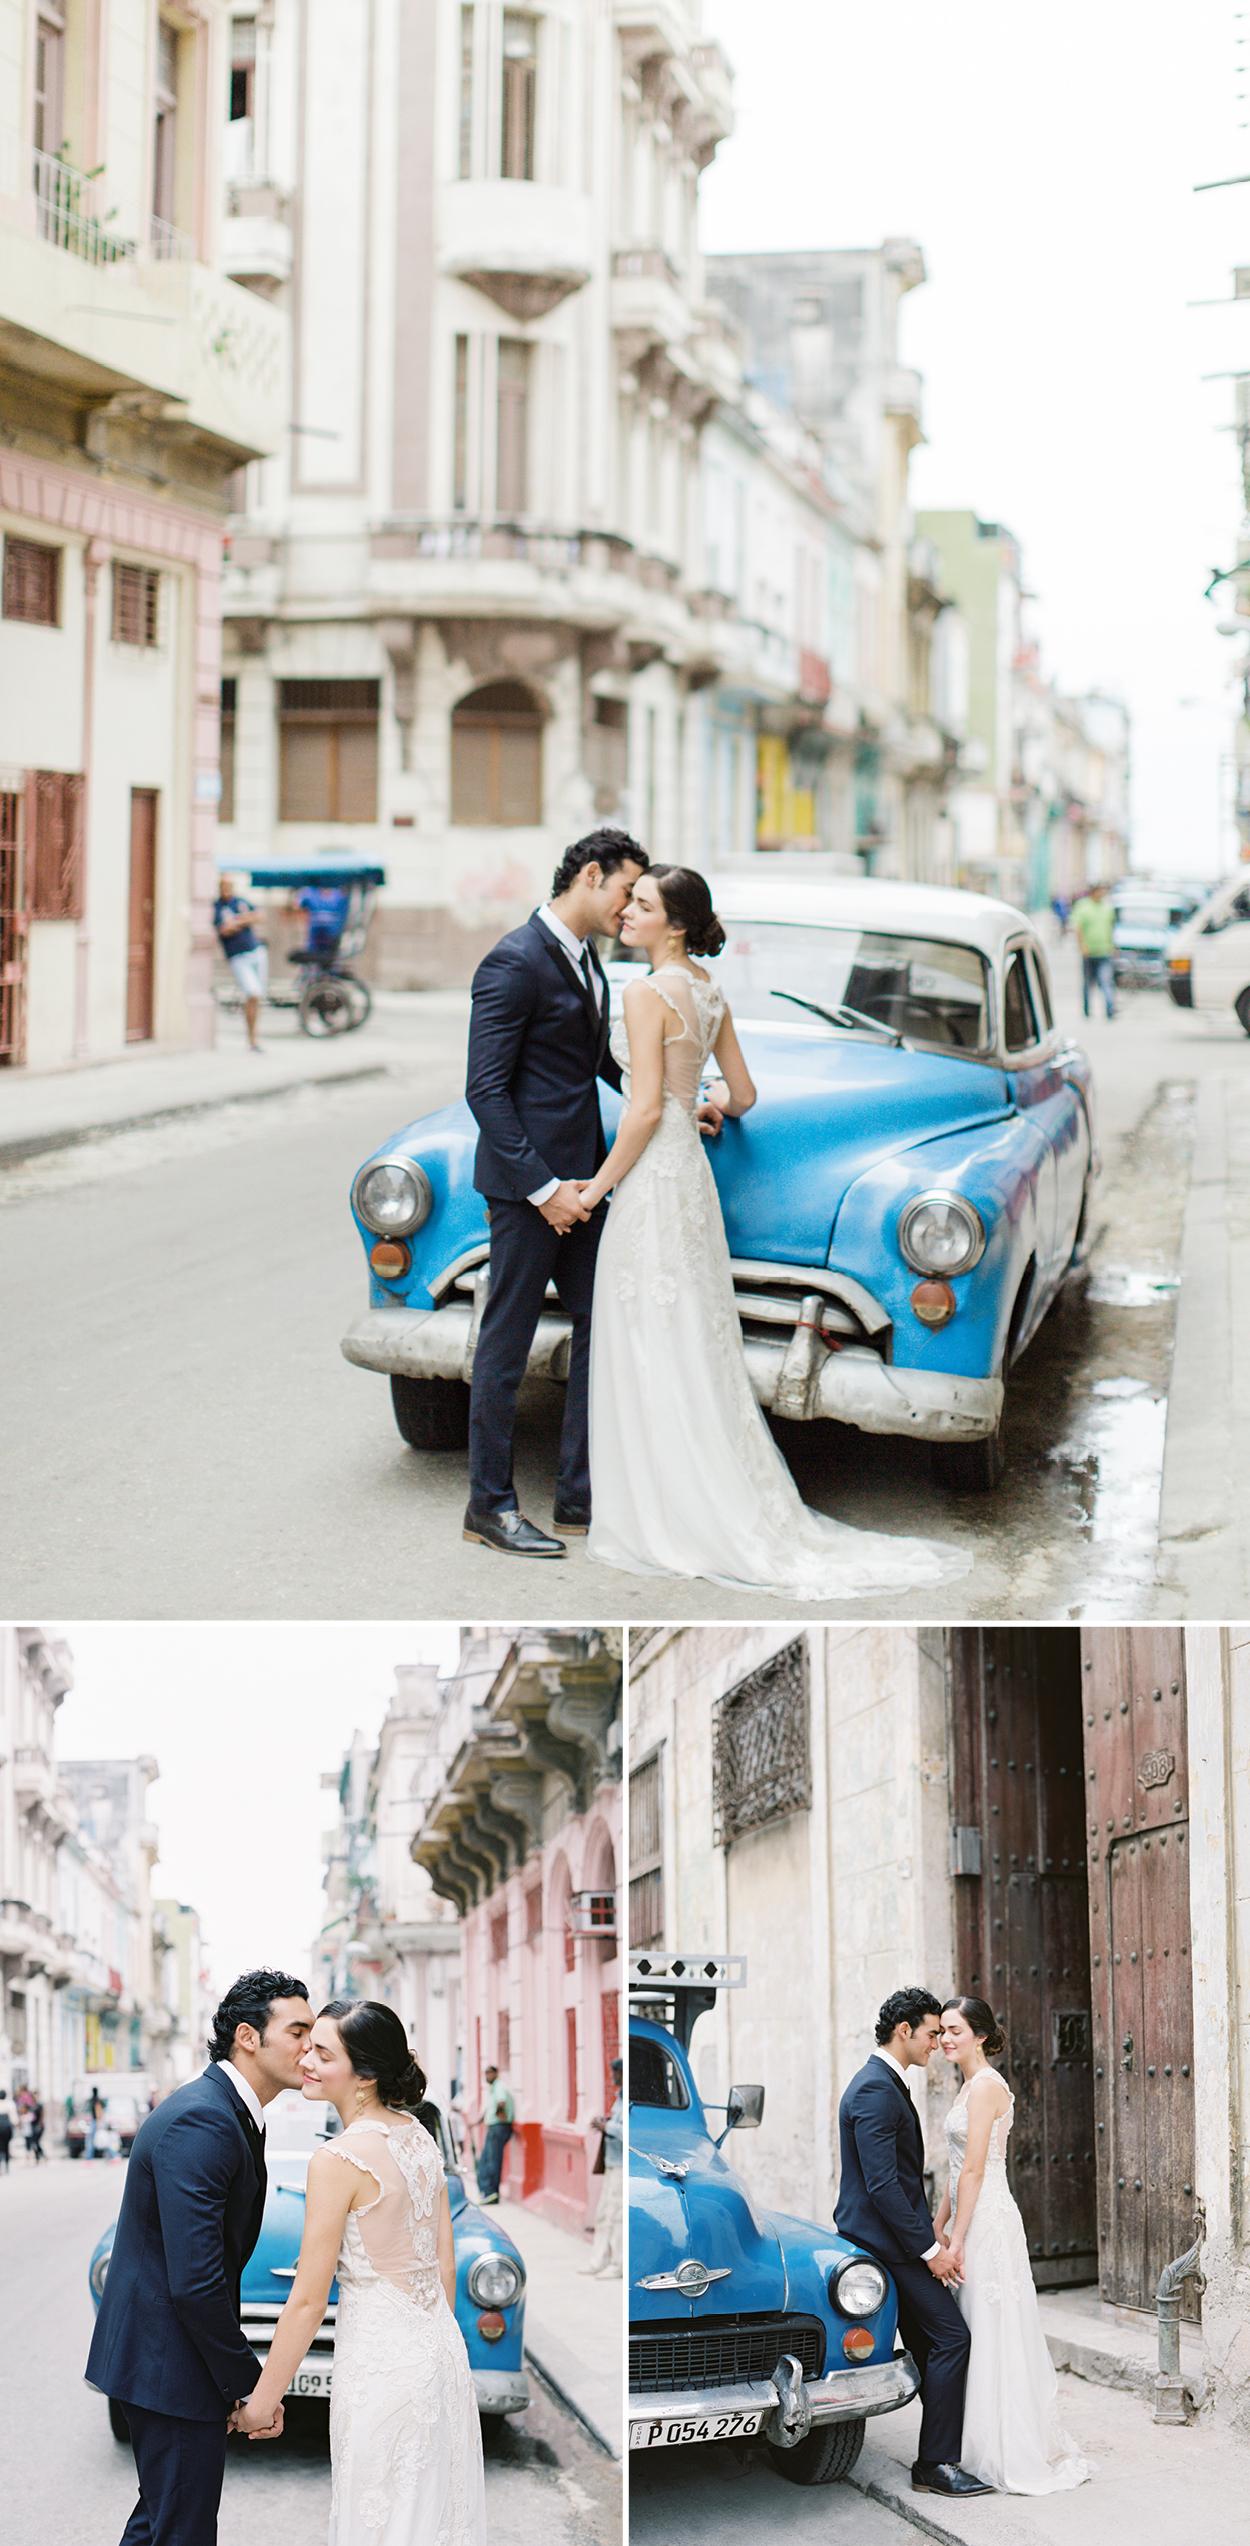 MatthewRee_Cuba_2_013.jpg